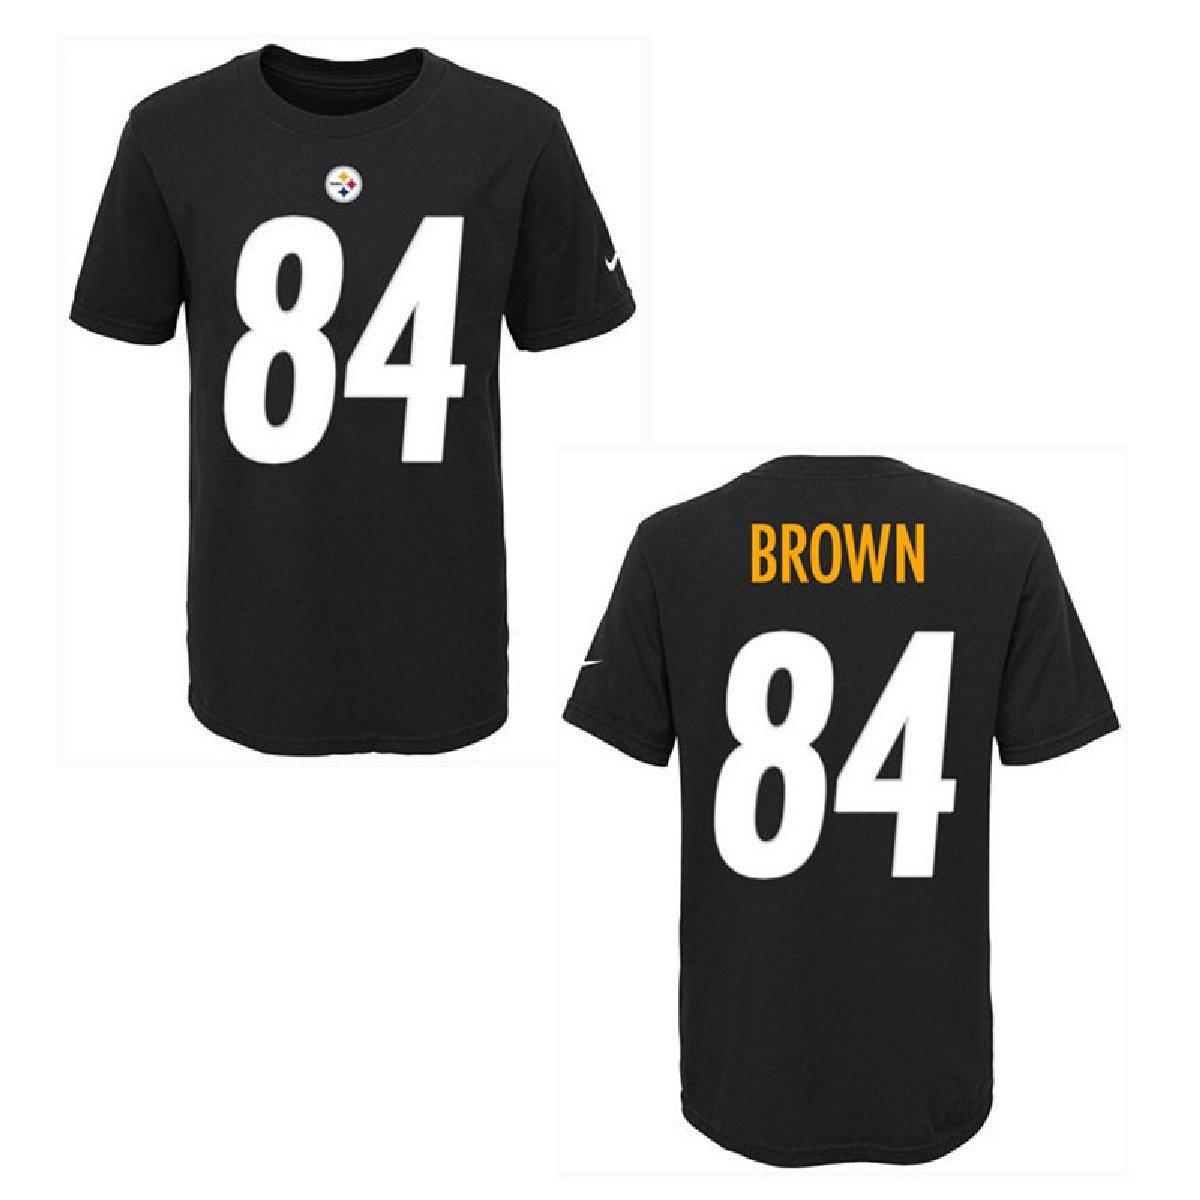 e8d39e1c Amazon.com : NIKE Pittsburgh Steelers Antonio Brown Black Youth Player  Pride Tee2 T-Shirt : Sports & Outdoors